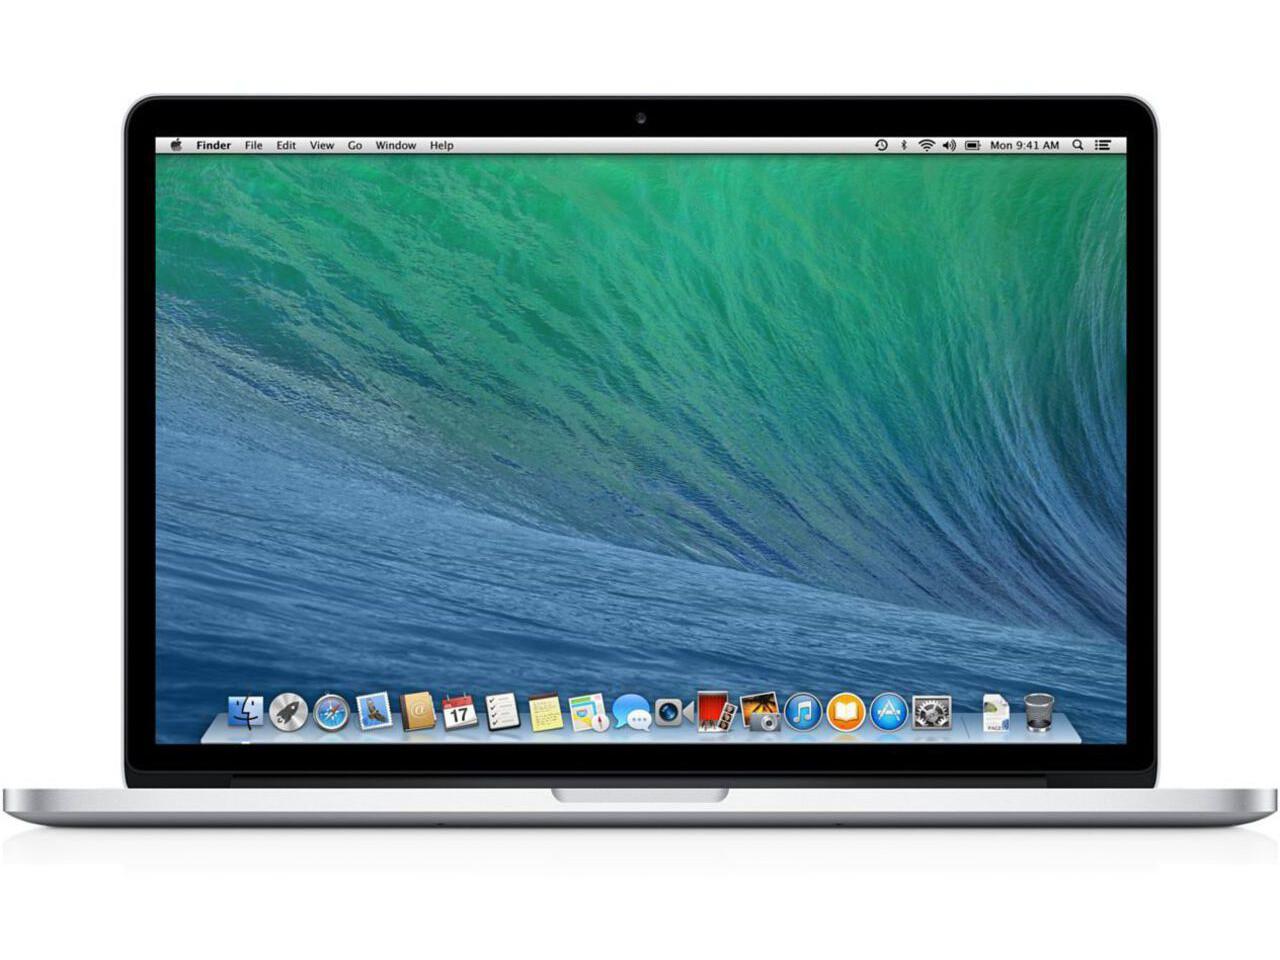 macbook pro 15 inch 2013 silver